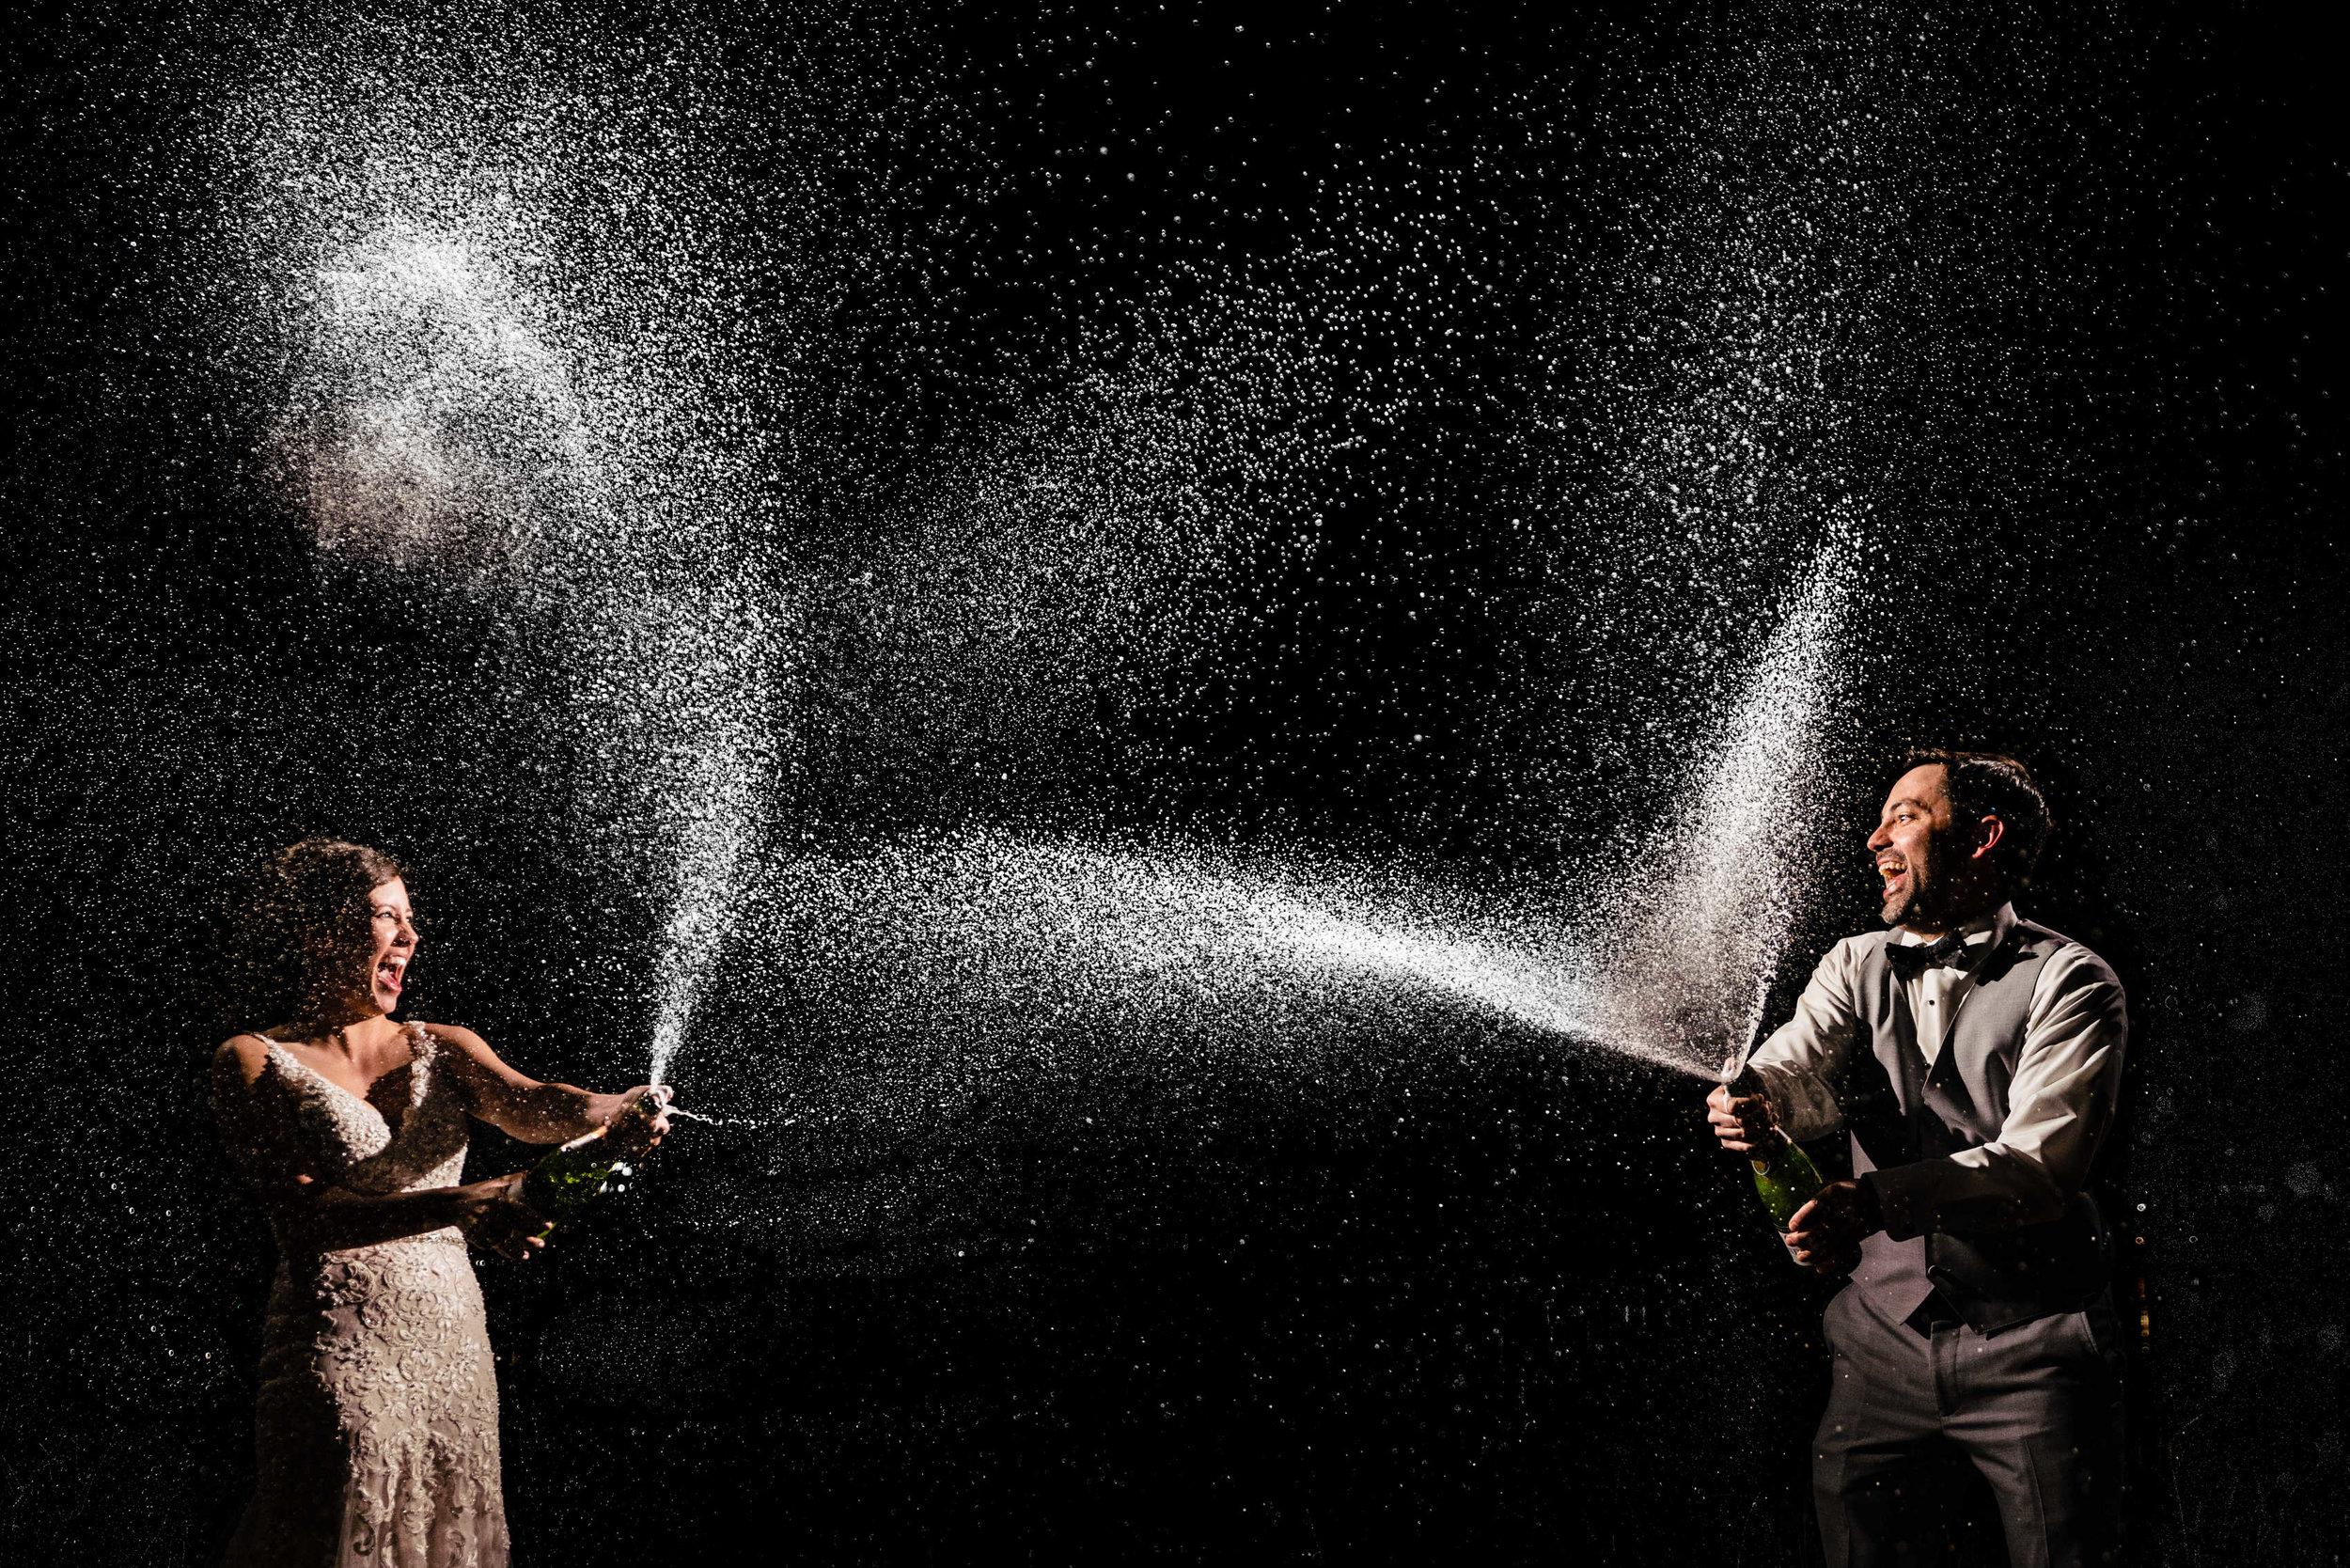 Best Wedding Photographers.Colorado Wedding Photographer Jmgant Photography Jared M Gant